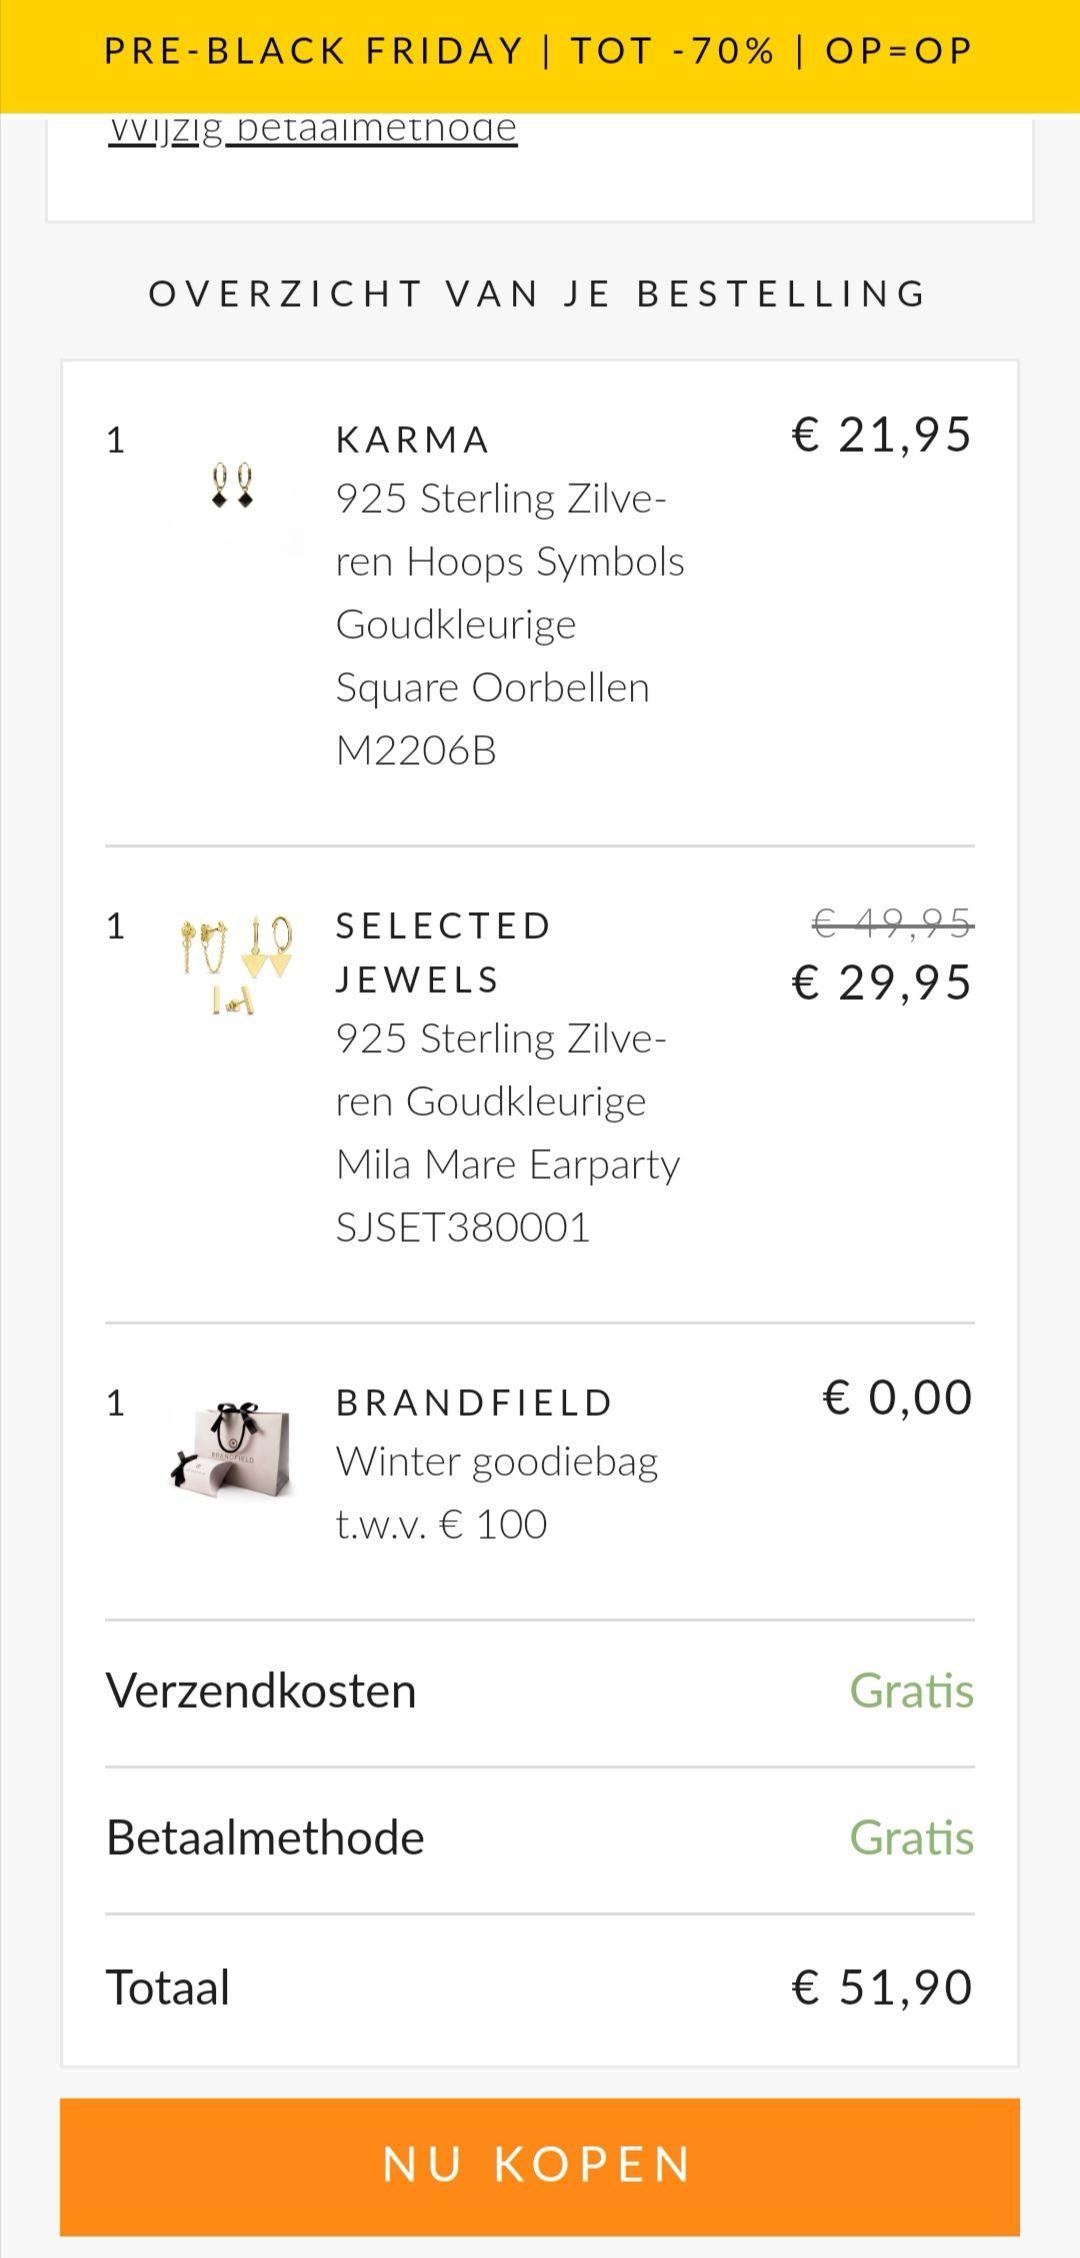 Brandfield Goodiebag t.w.v. €100